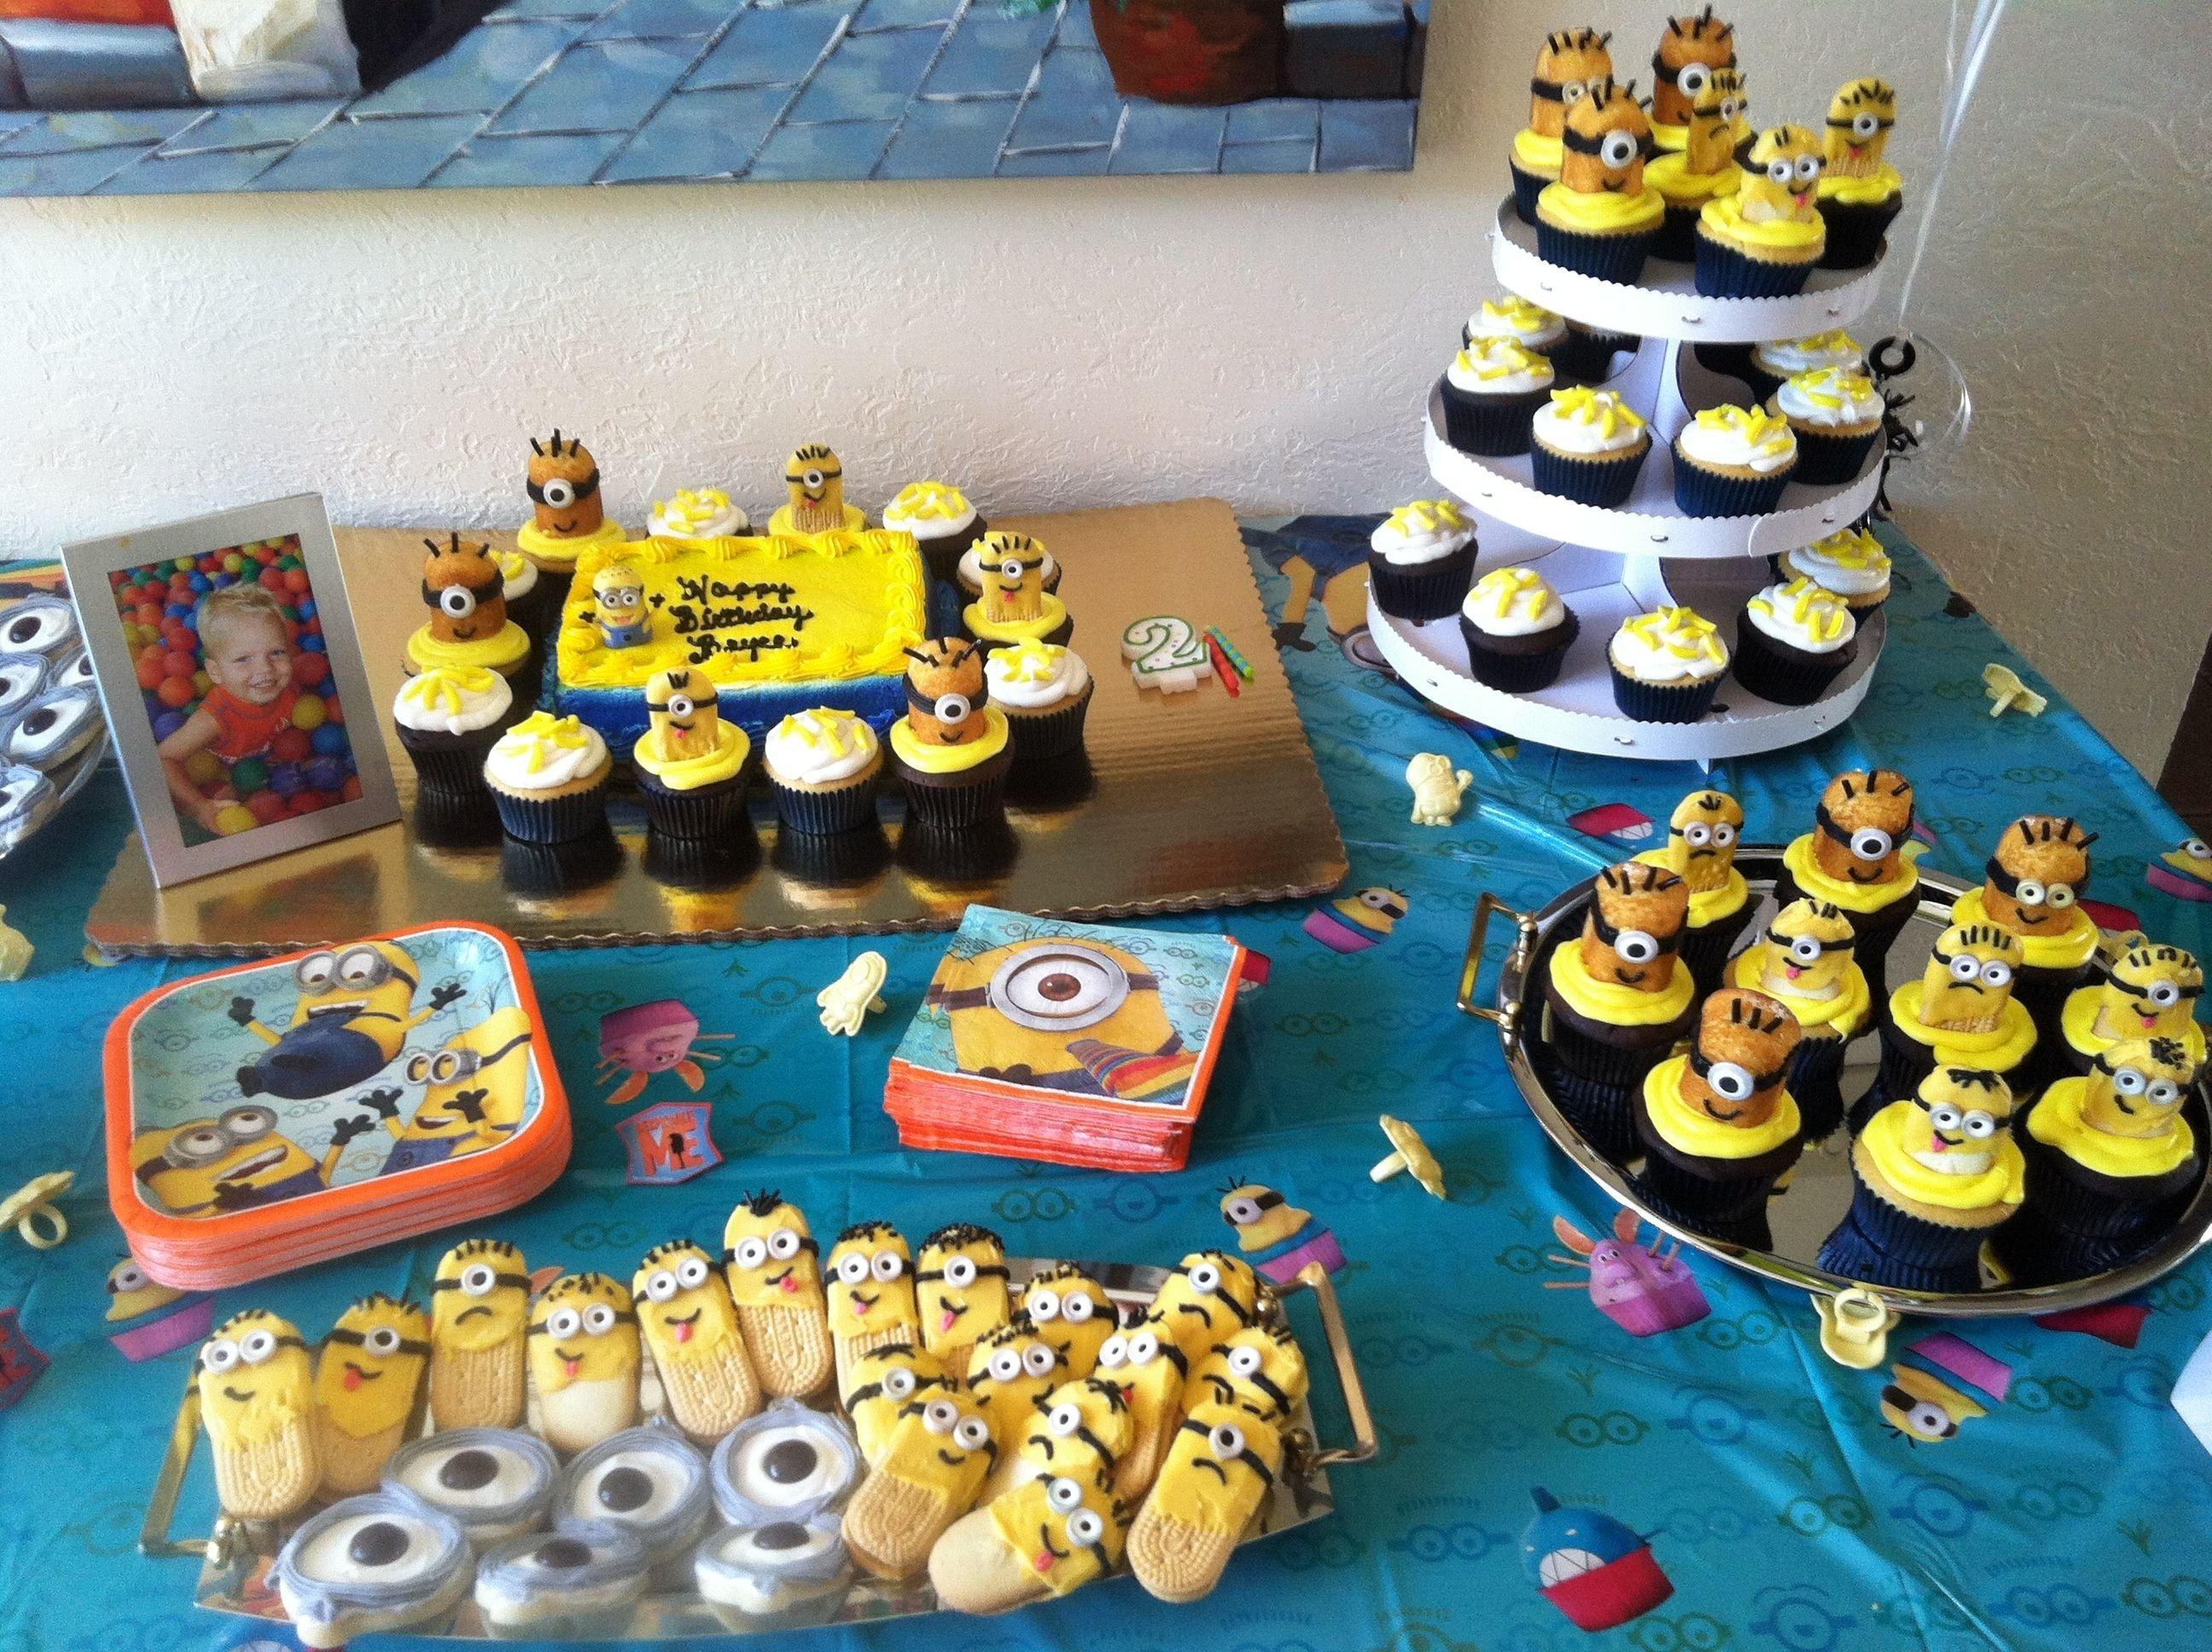 10 Ideal 2 Yr Old Birthday Ideas Minion Bash My Year Loved His